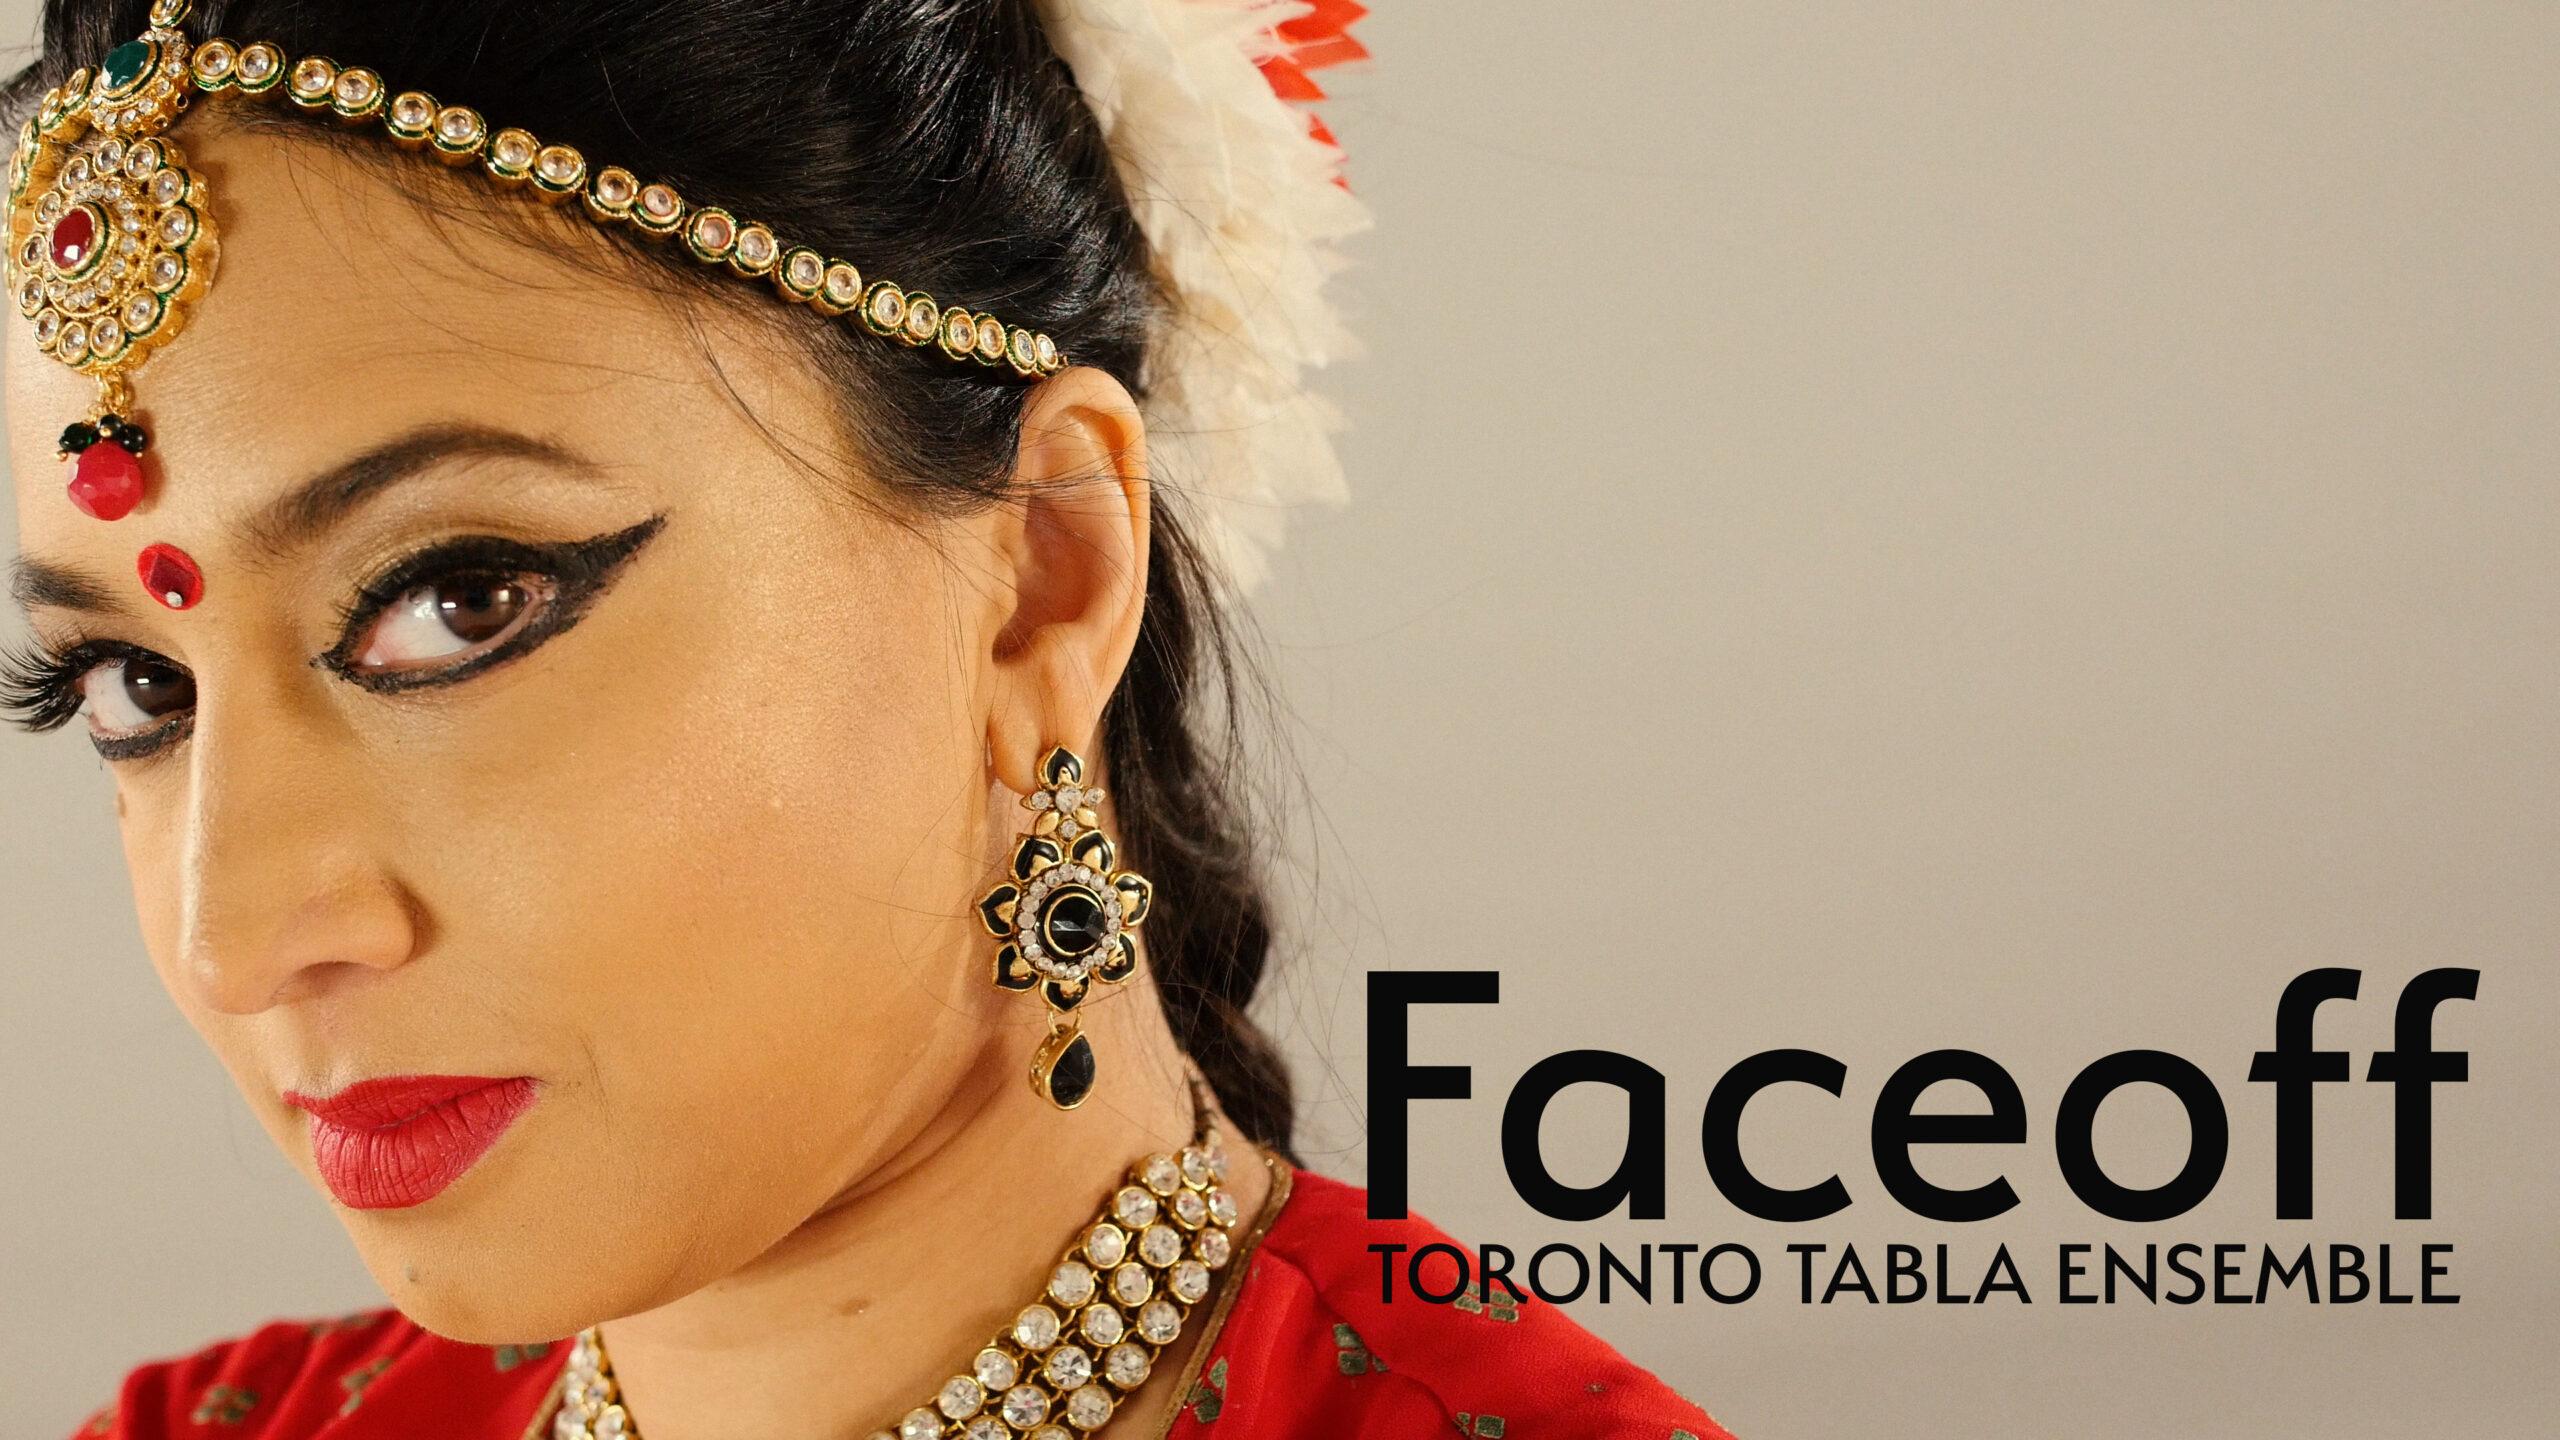 Faceoff Video Thumbnail 2